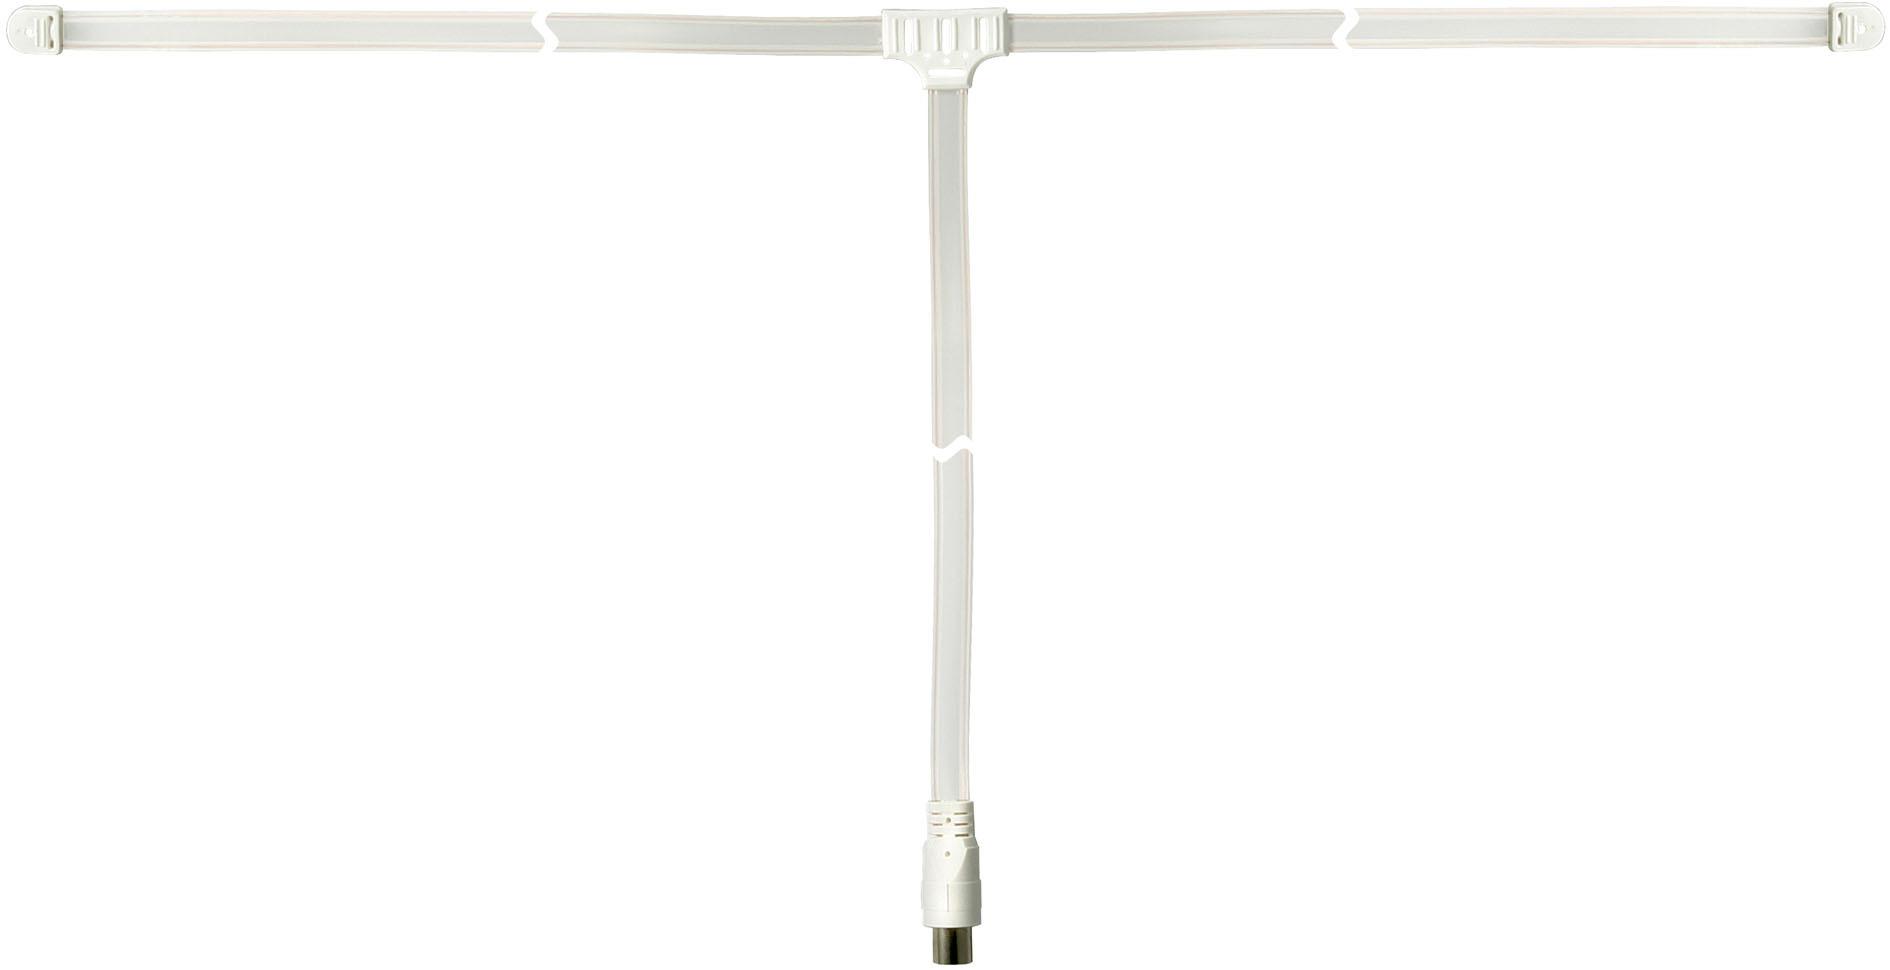 10x ukw wurfantenne mit koax kupplung ukw dipol antenne ebay. Black Bedroom Furniture Sets. Home Design Ideas